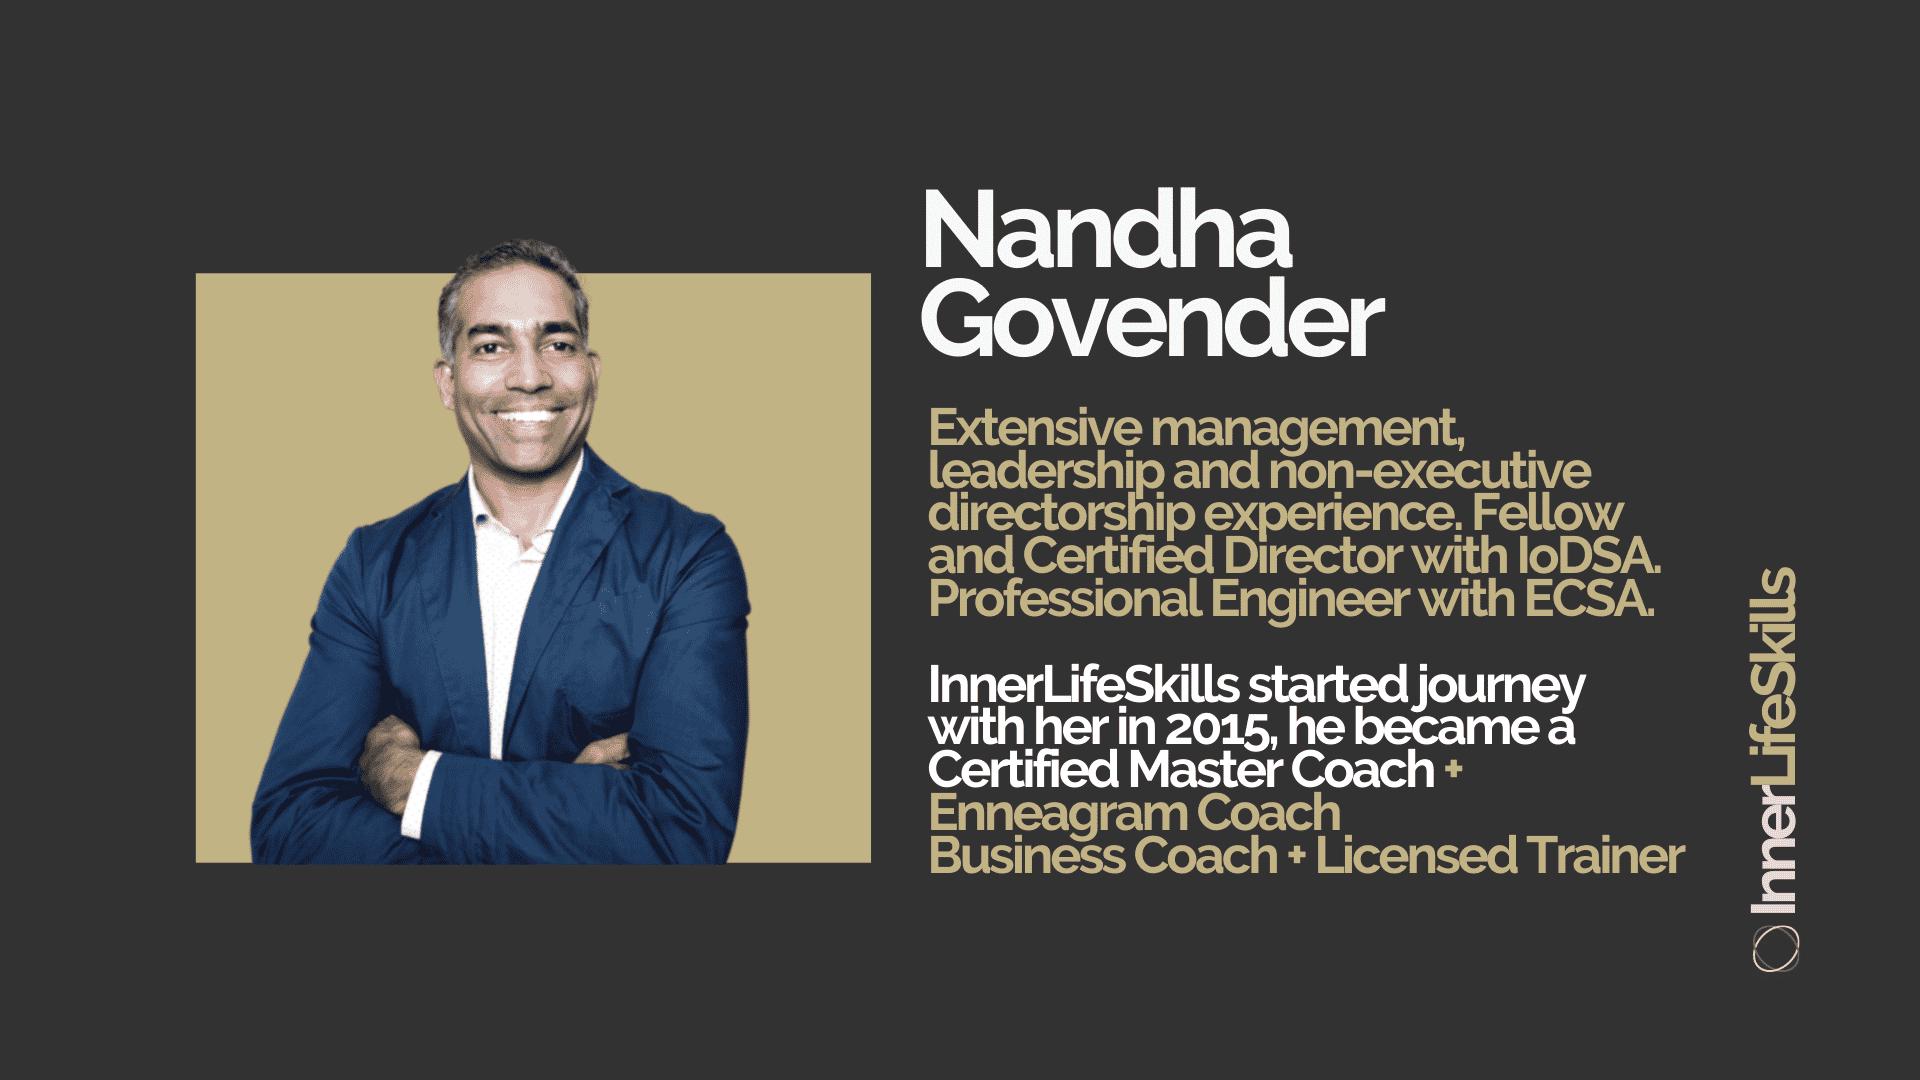 Nandha Govender Case Study Info